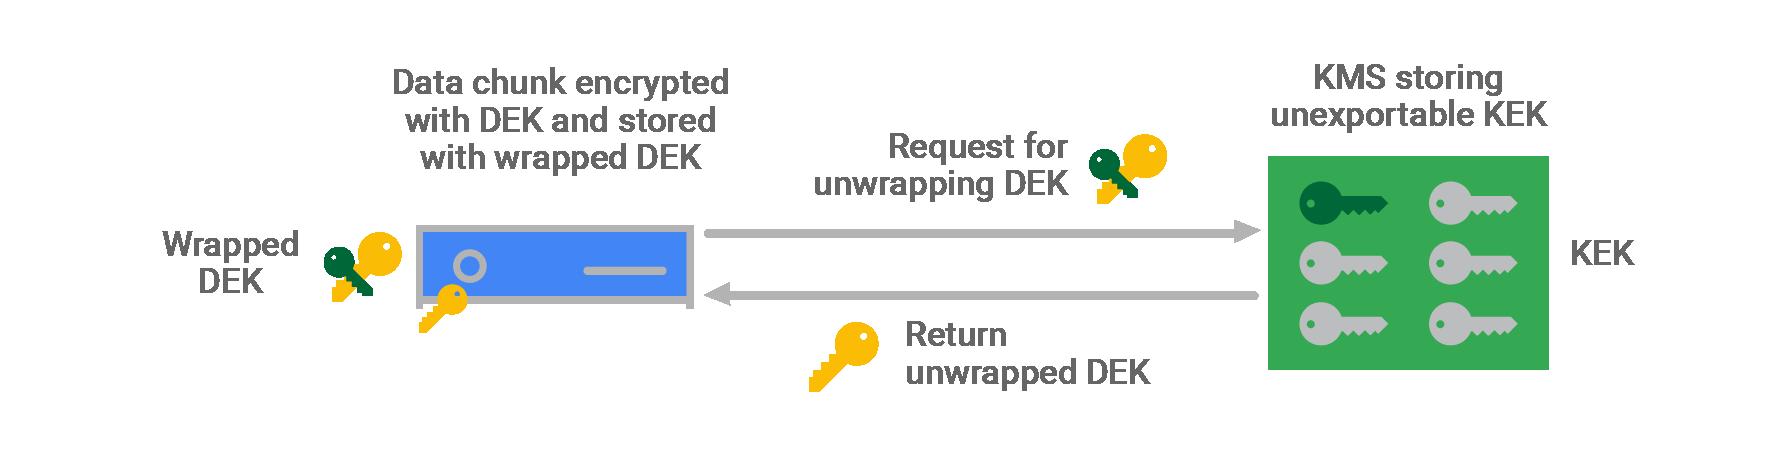 Diagram of data chunk decryption